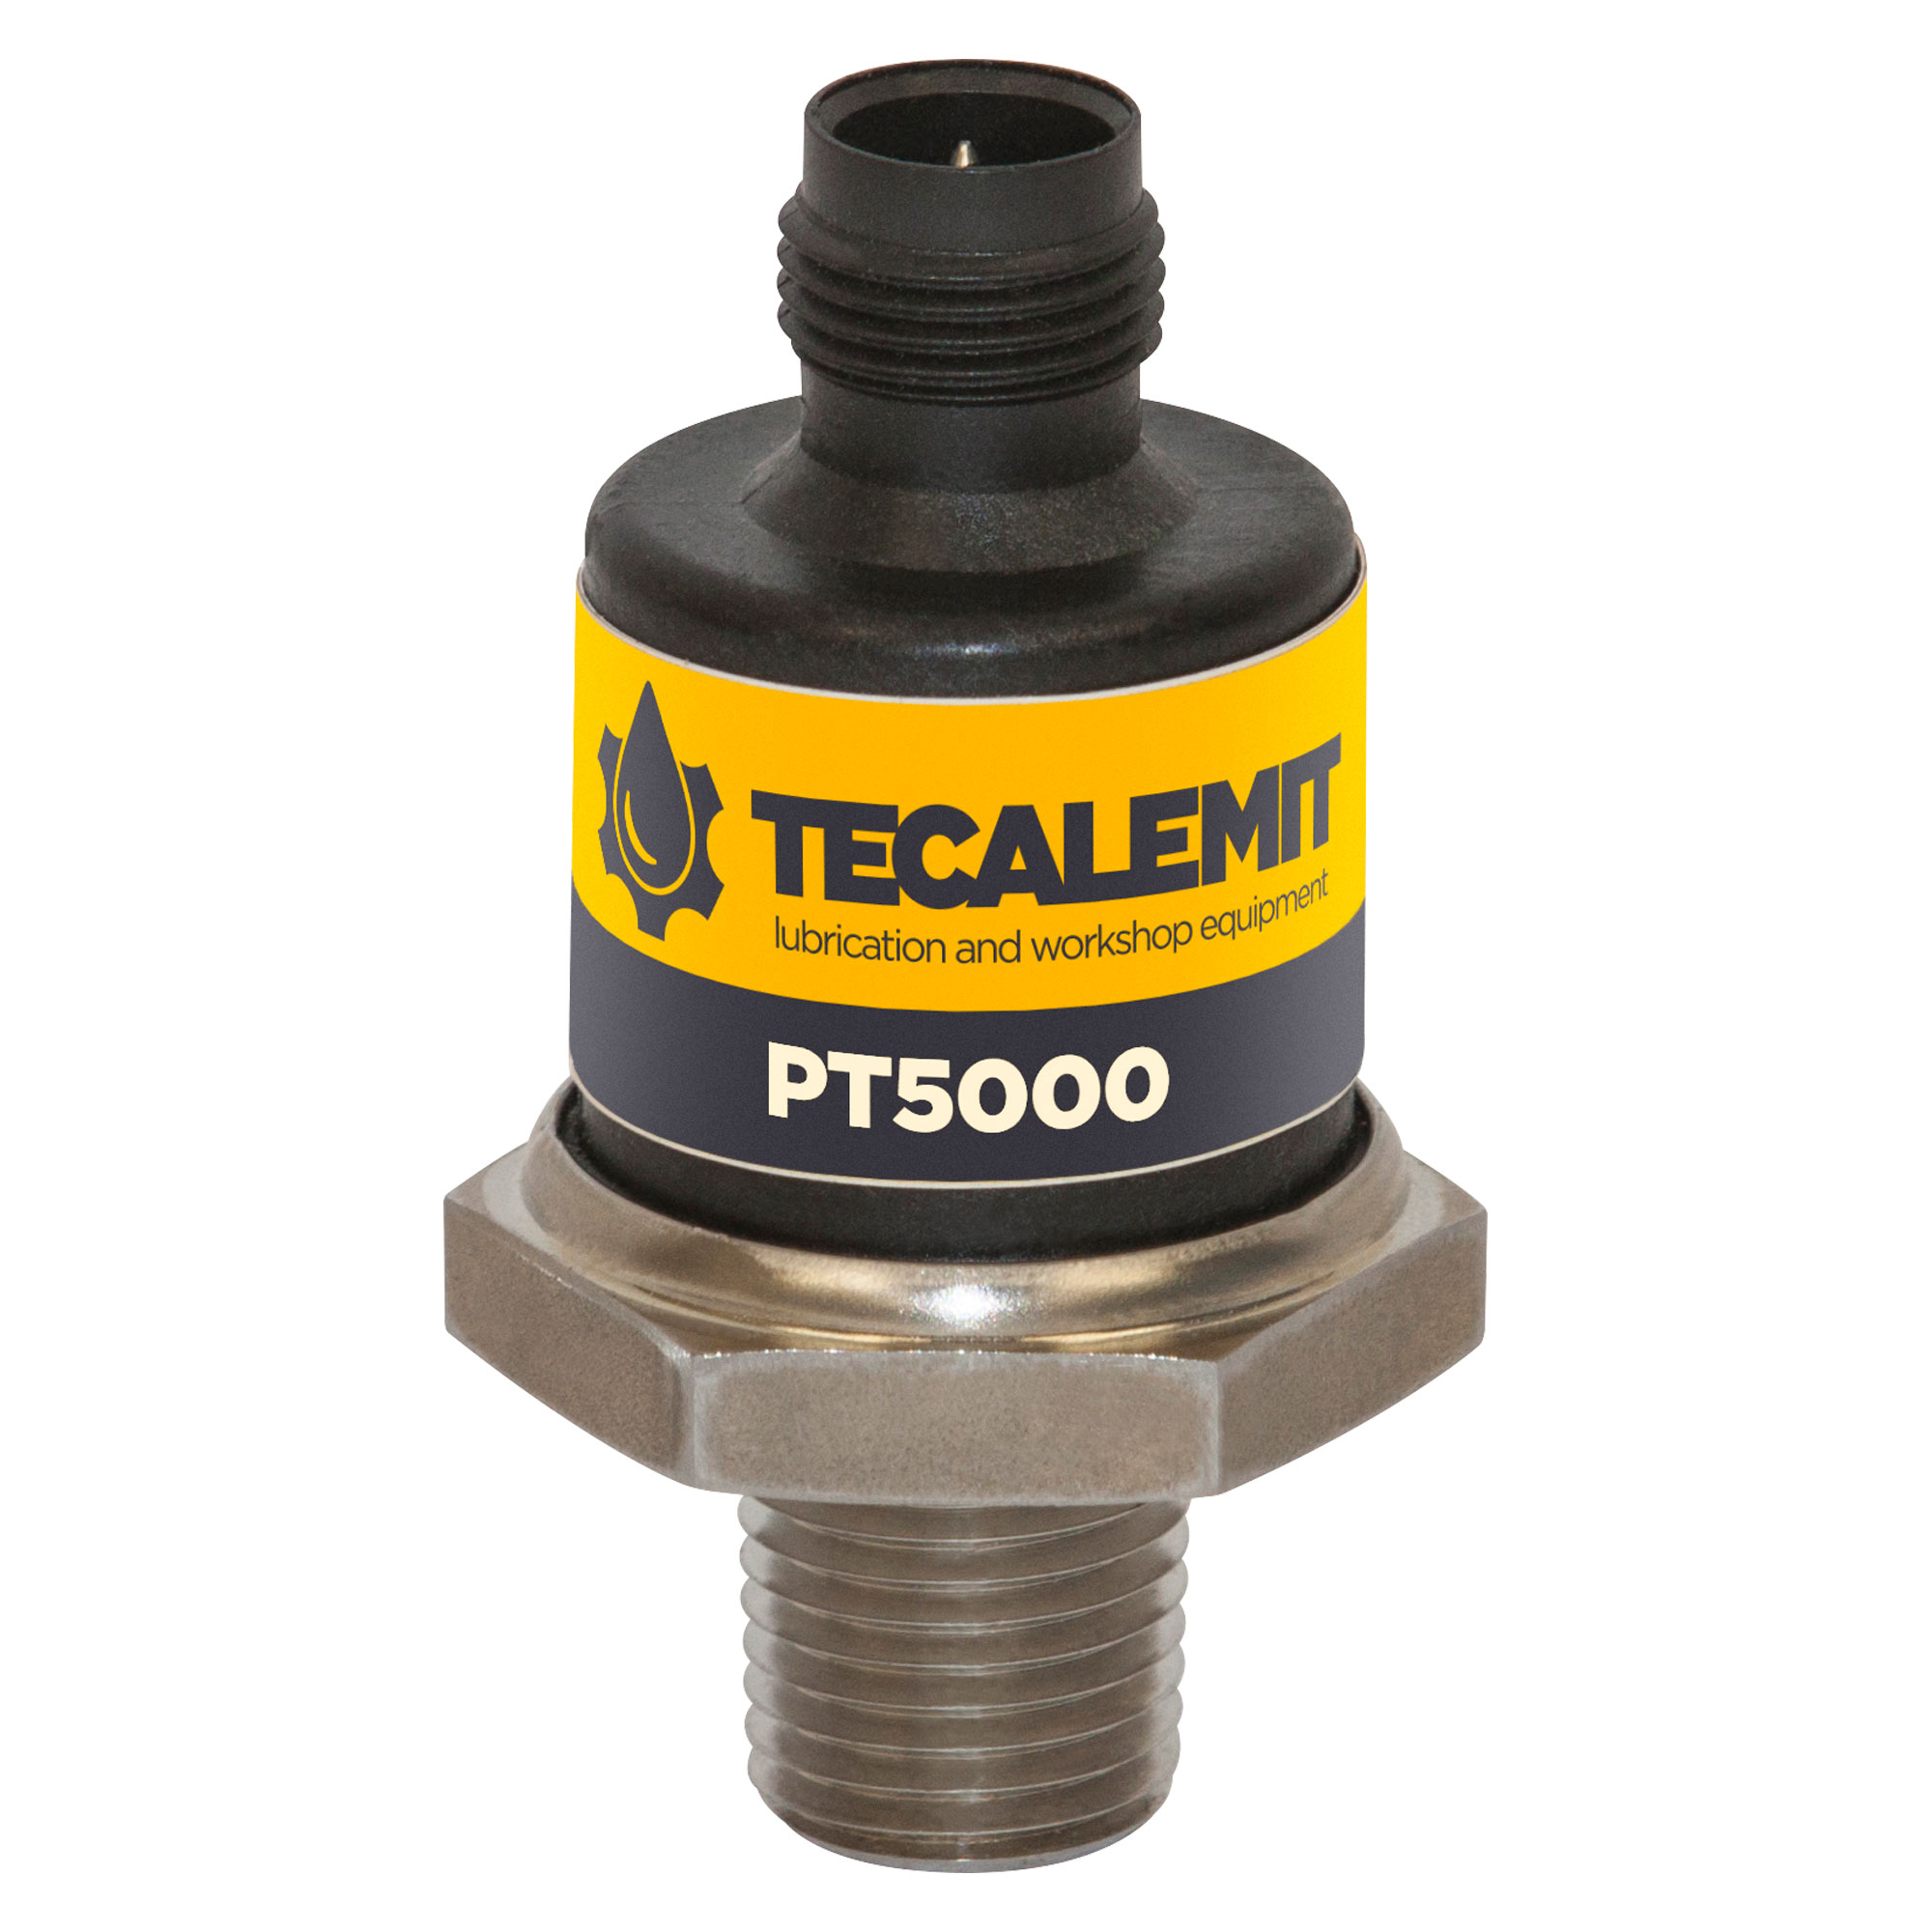 PT5000 - Pressure Transducer